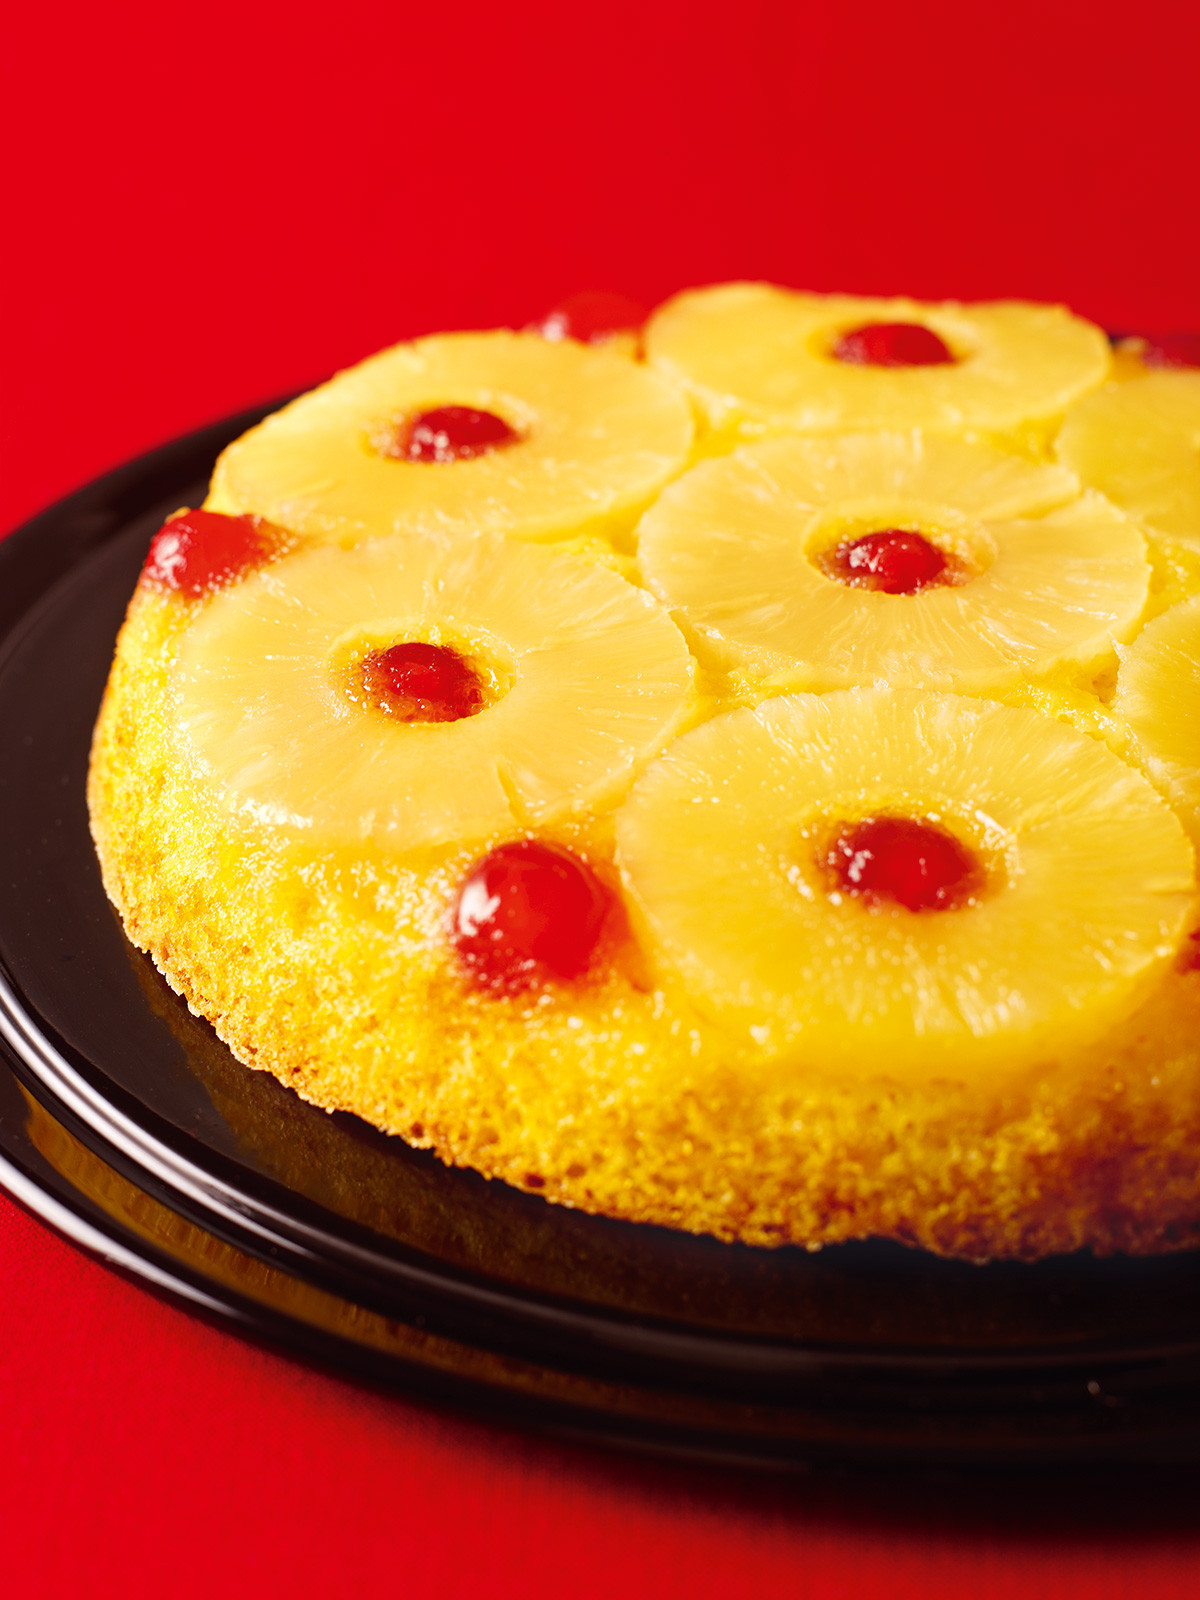 Pineapple Upside Down Cake Recipe  Pineapple Upside Down Cake Nigella s Recipes